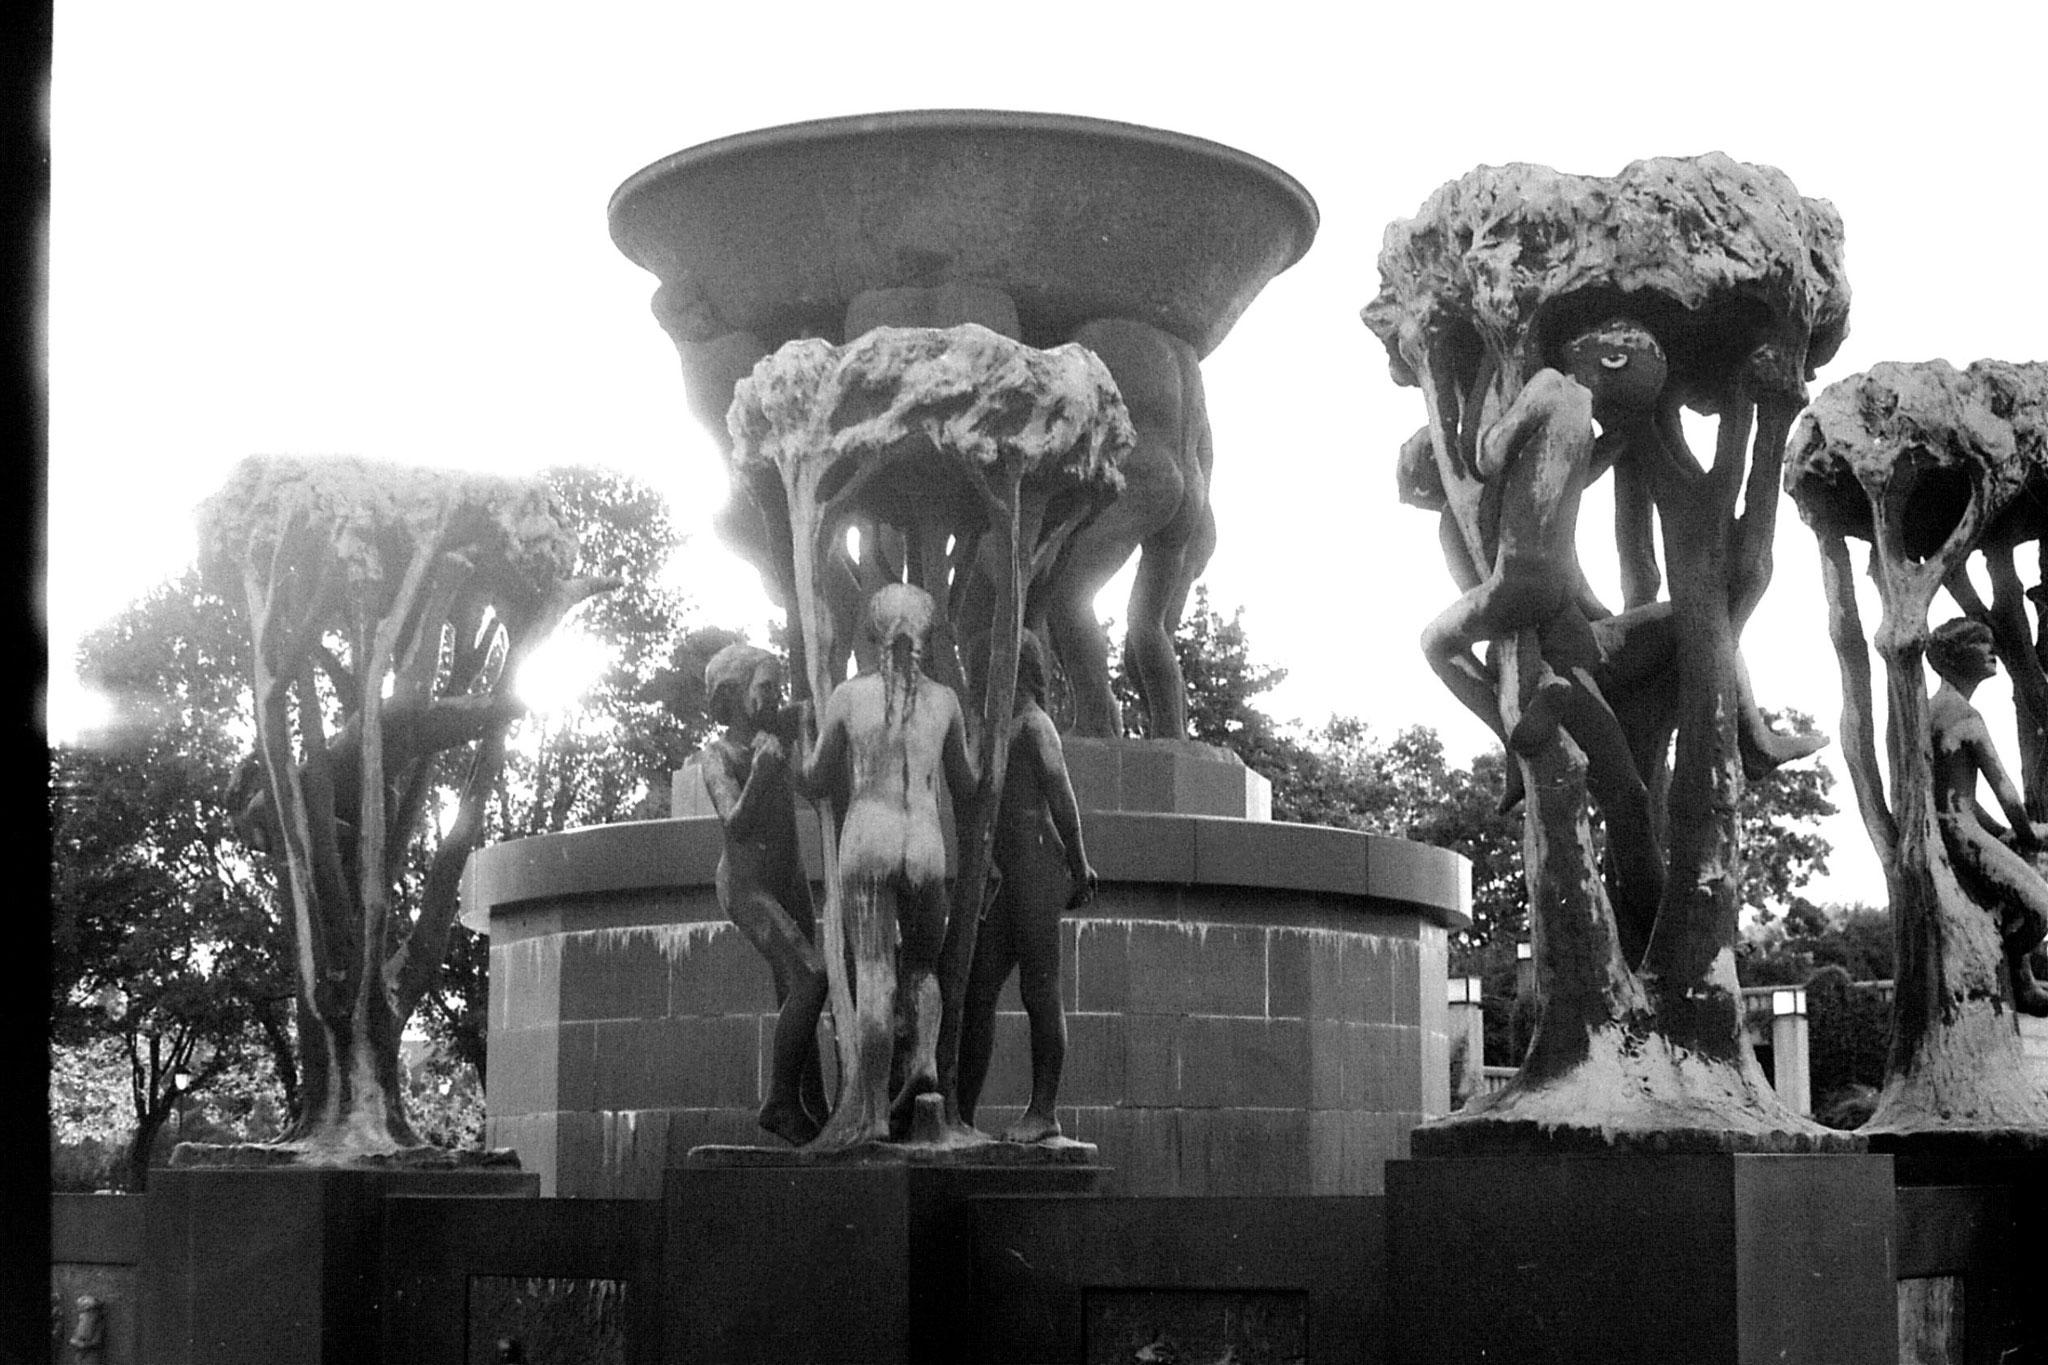 17/9/1988: 16: Vigeland sculpture park